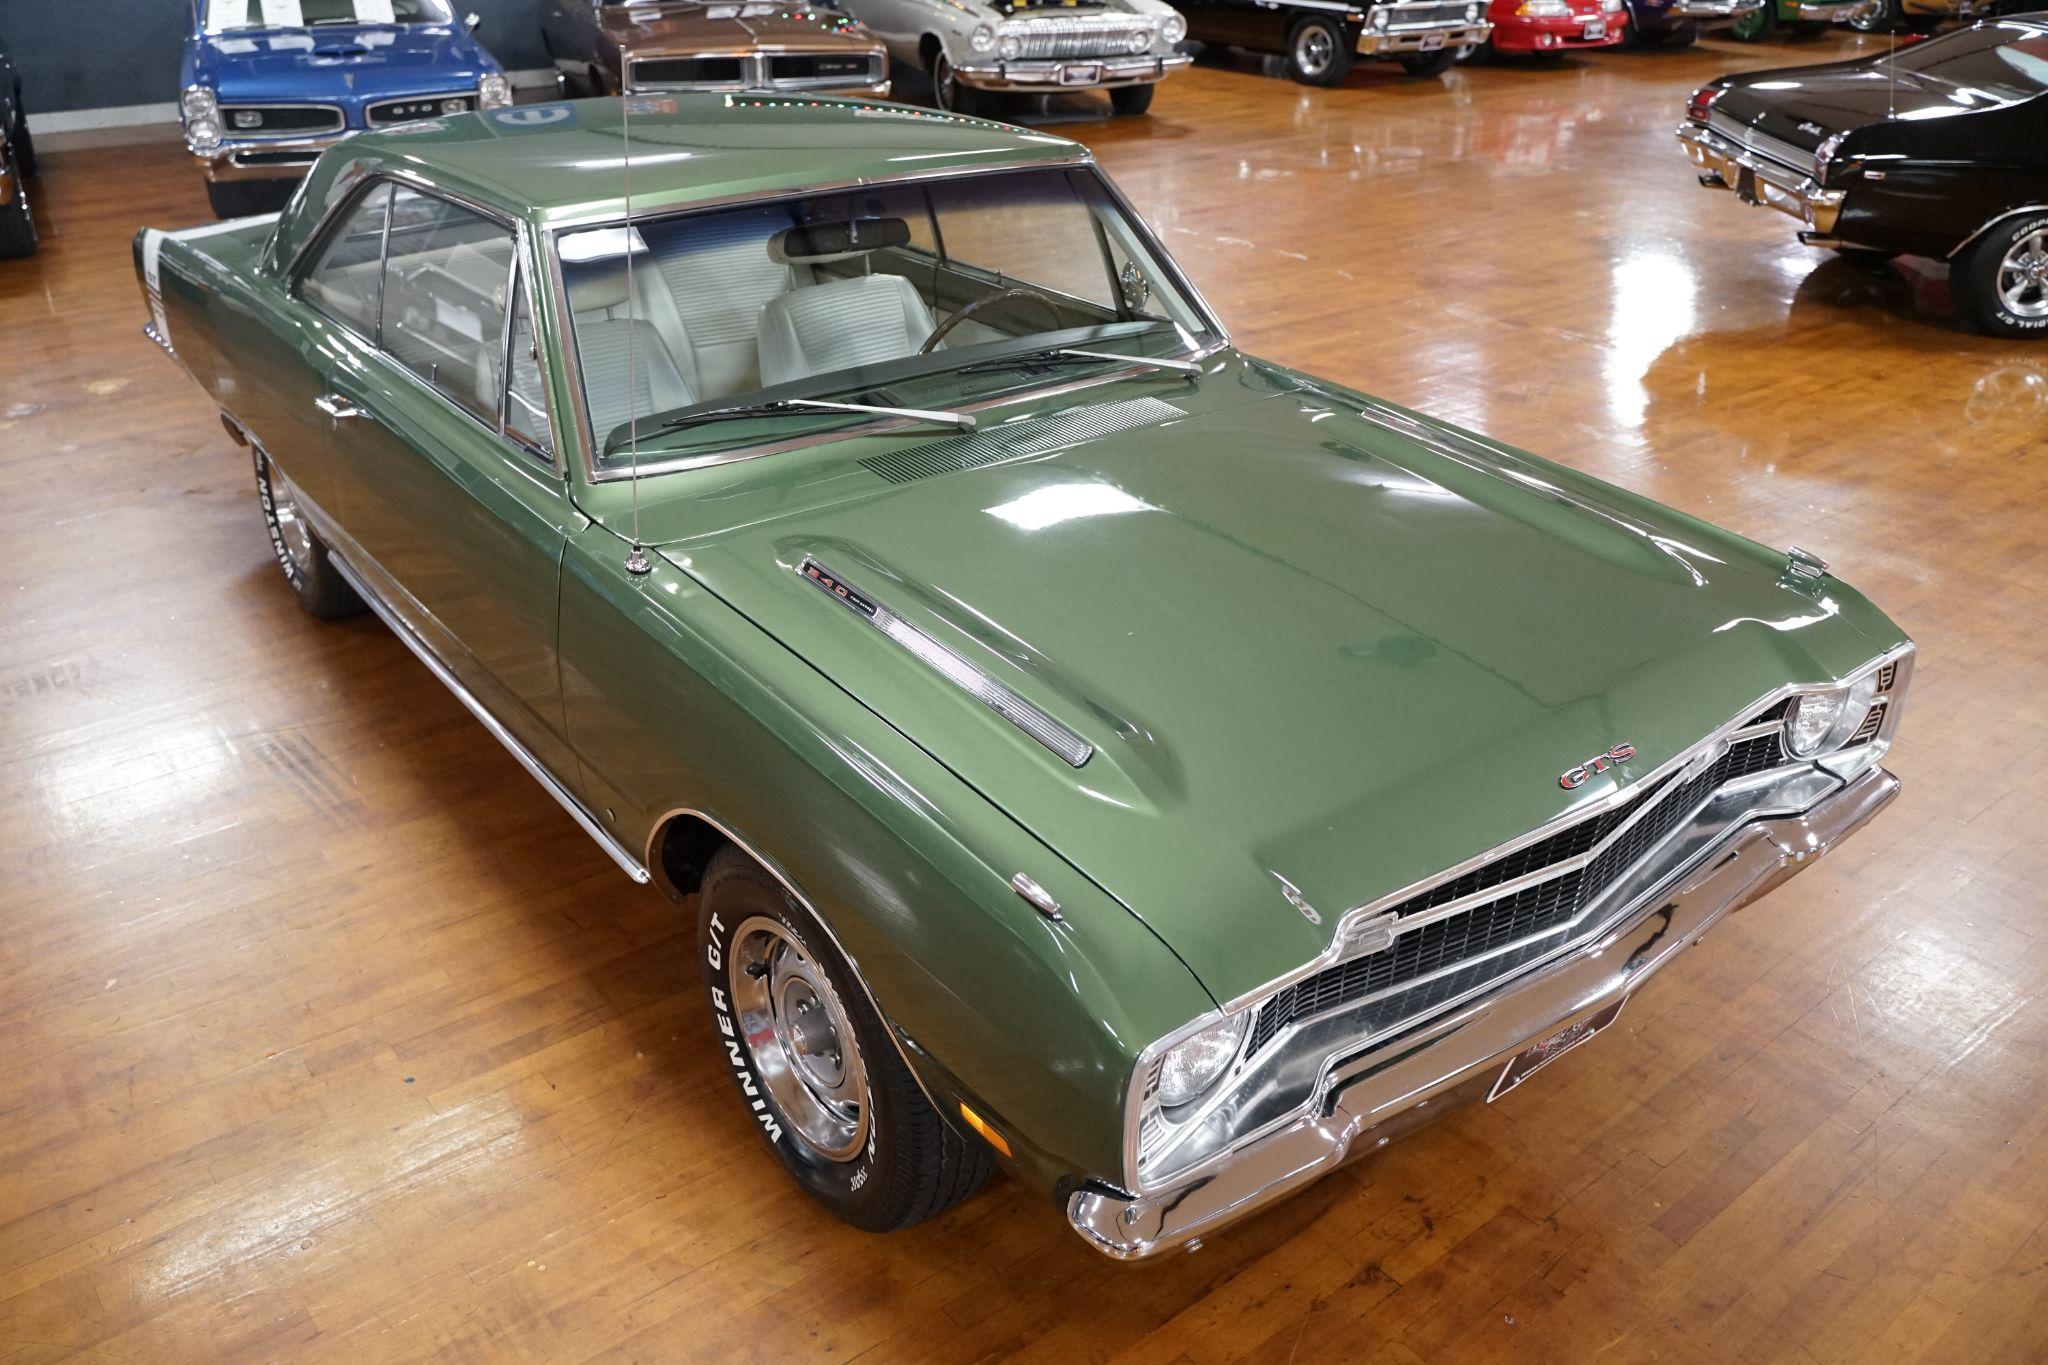 Used 1969 Dodge Dart For Sale In Daytona Beach Fl 32119 Hankster